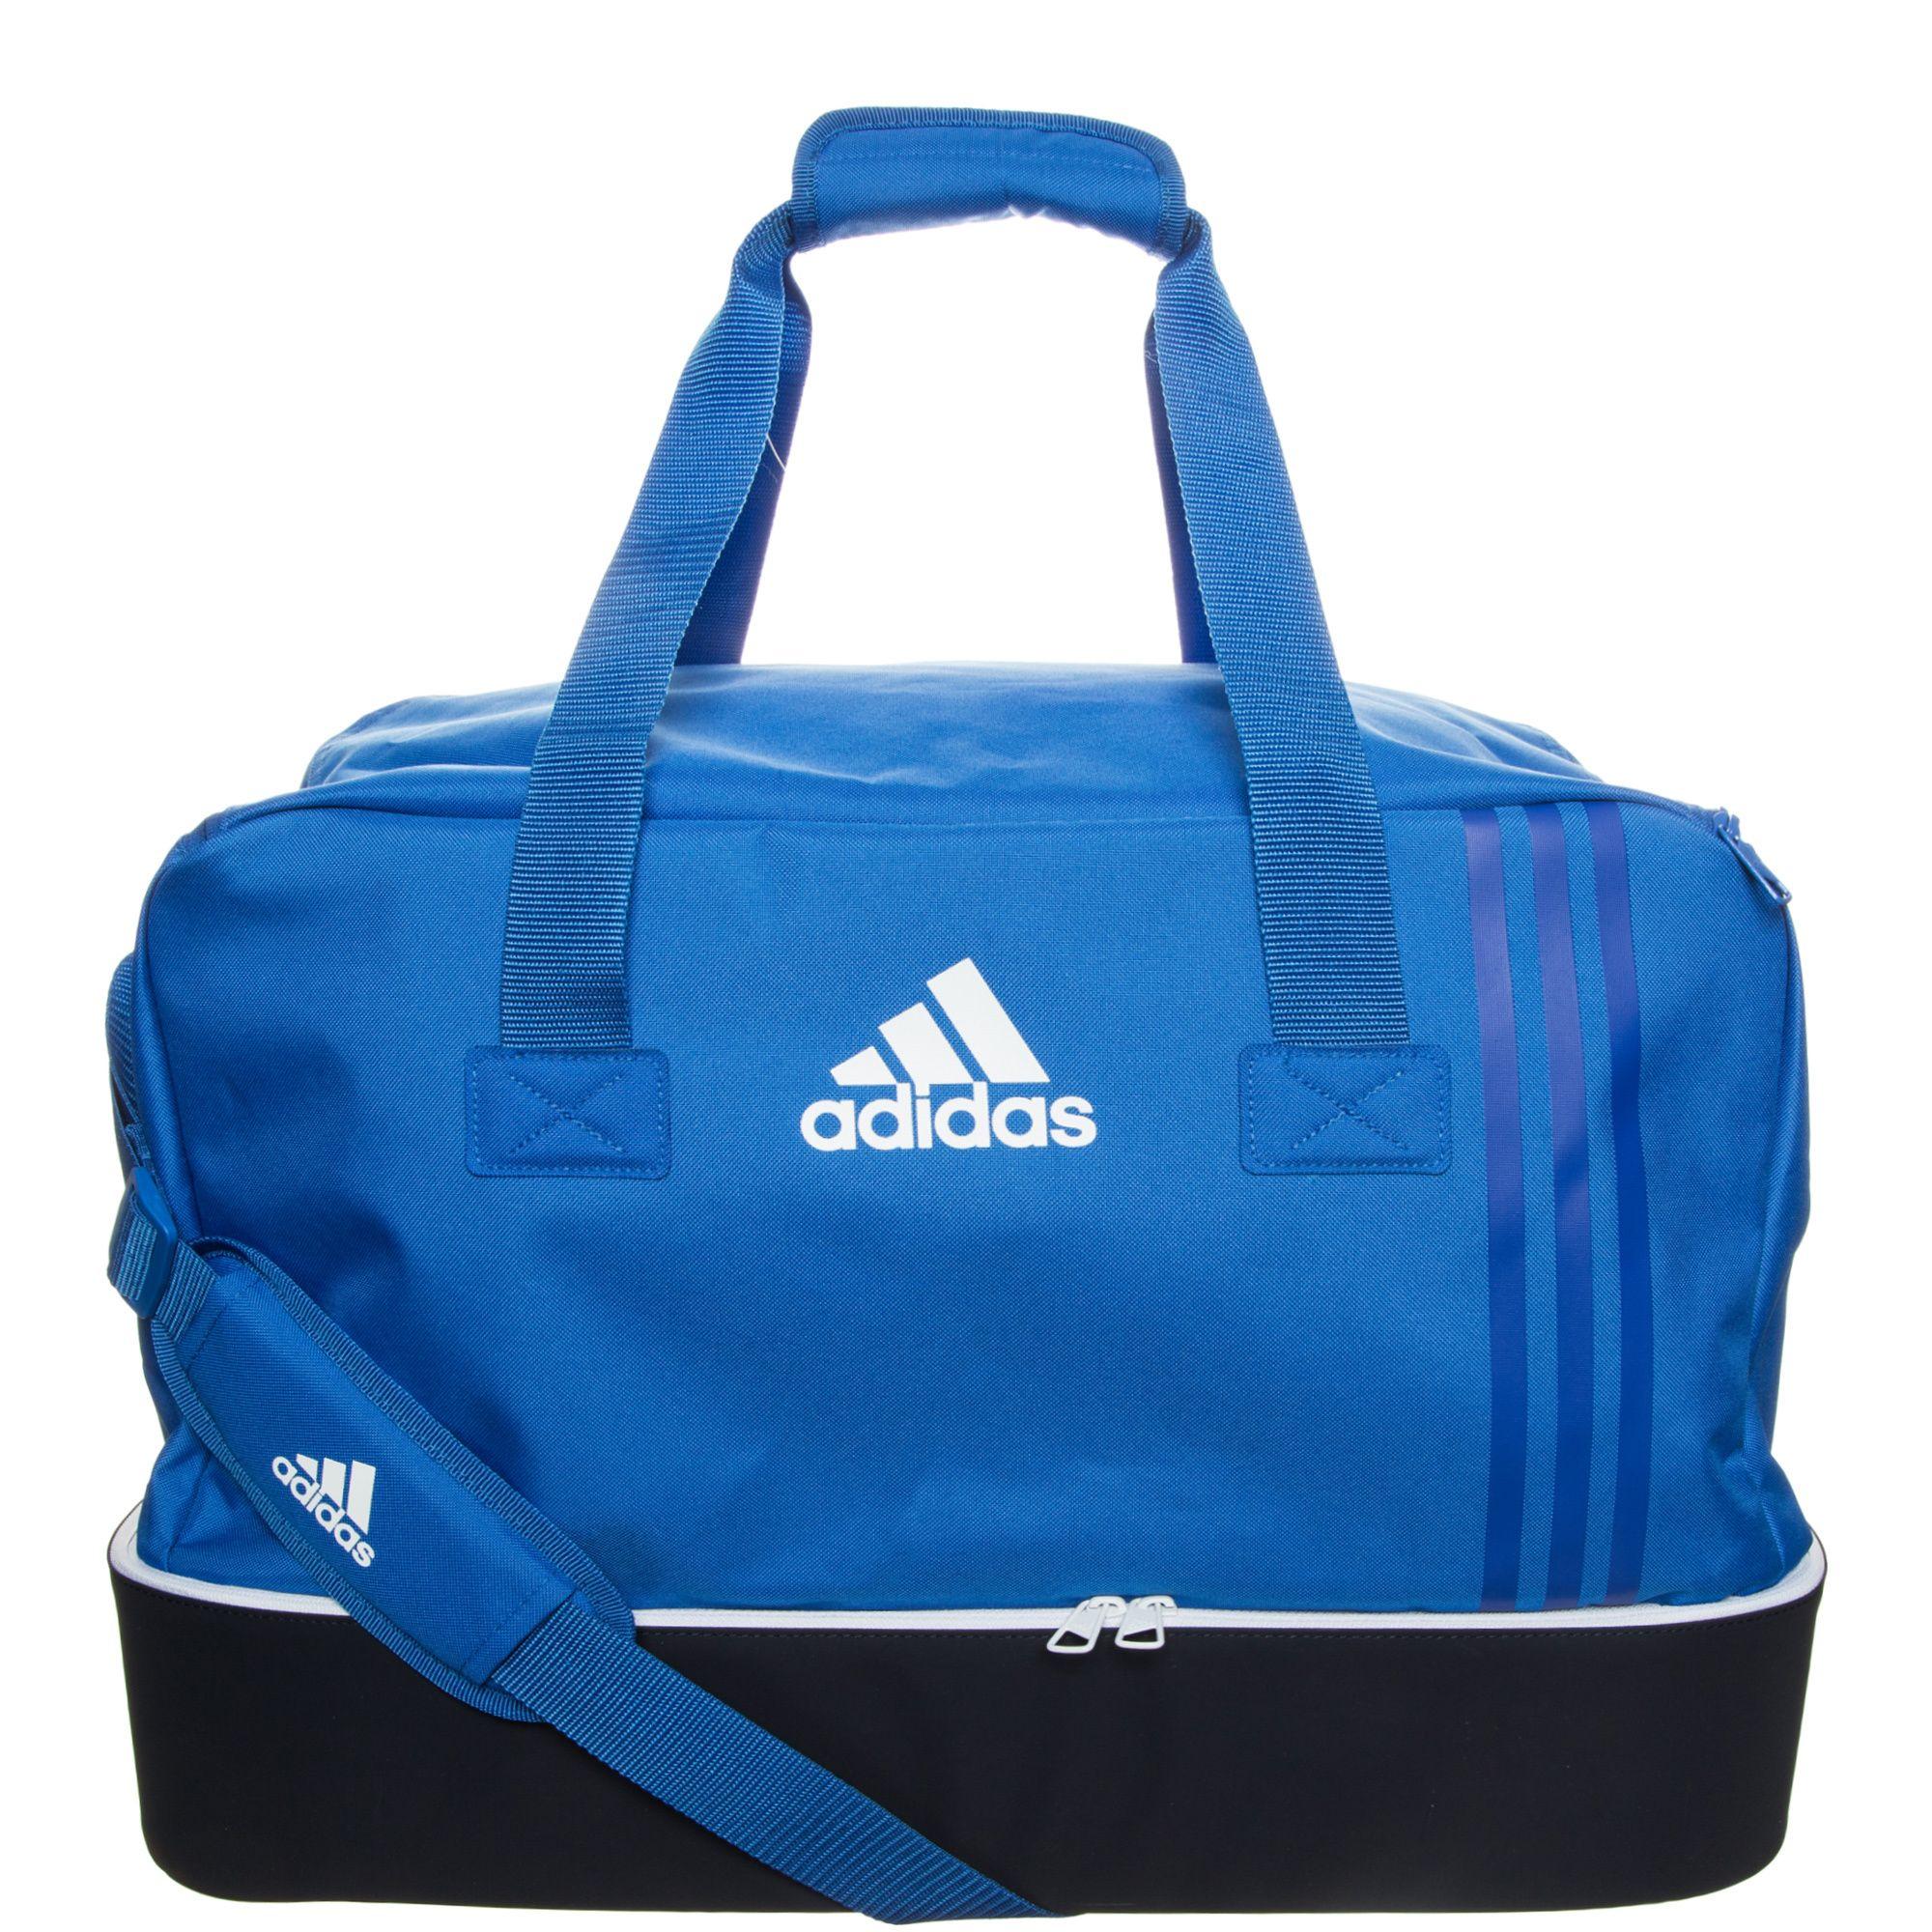 ADIDAS PERFORMANCE adidas Performance Sporttasche »Tiro Teambag Bottom Compartment Medium«